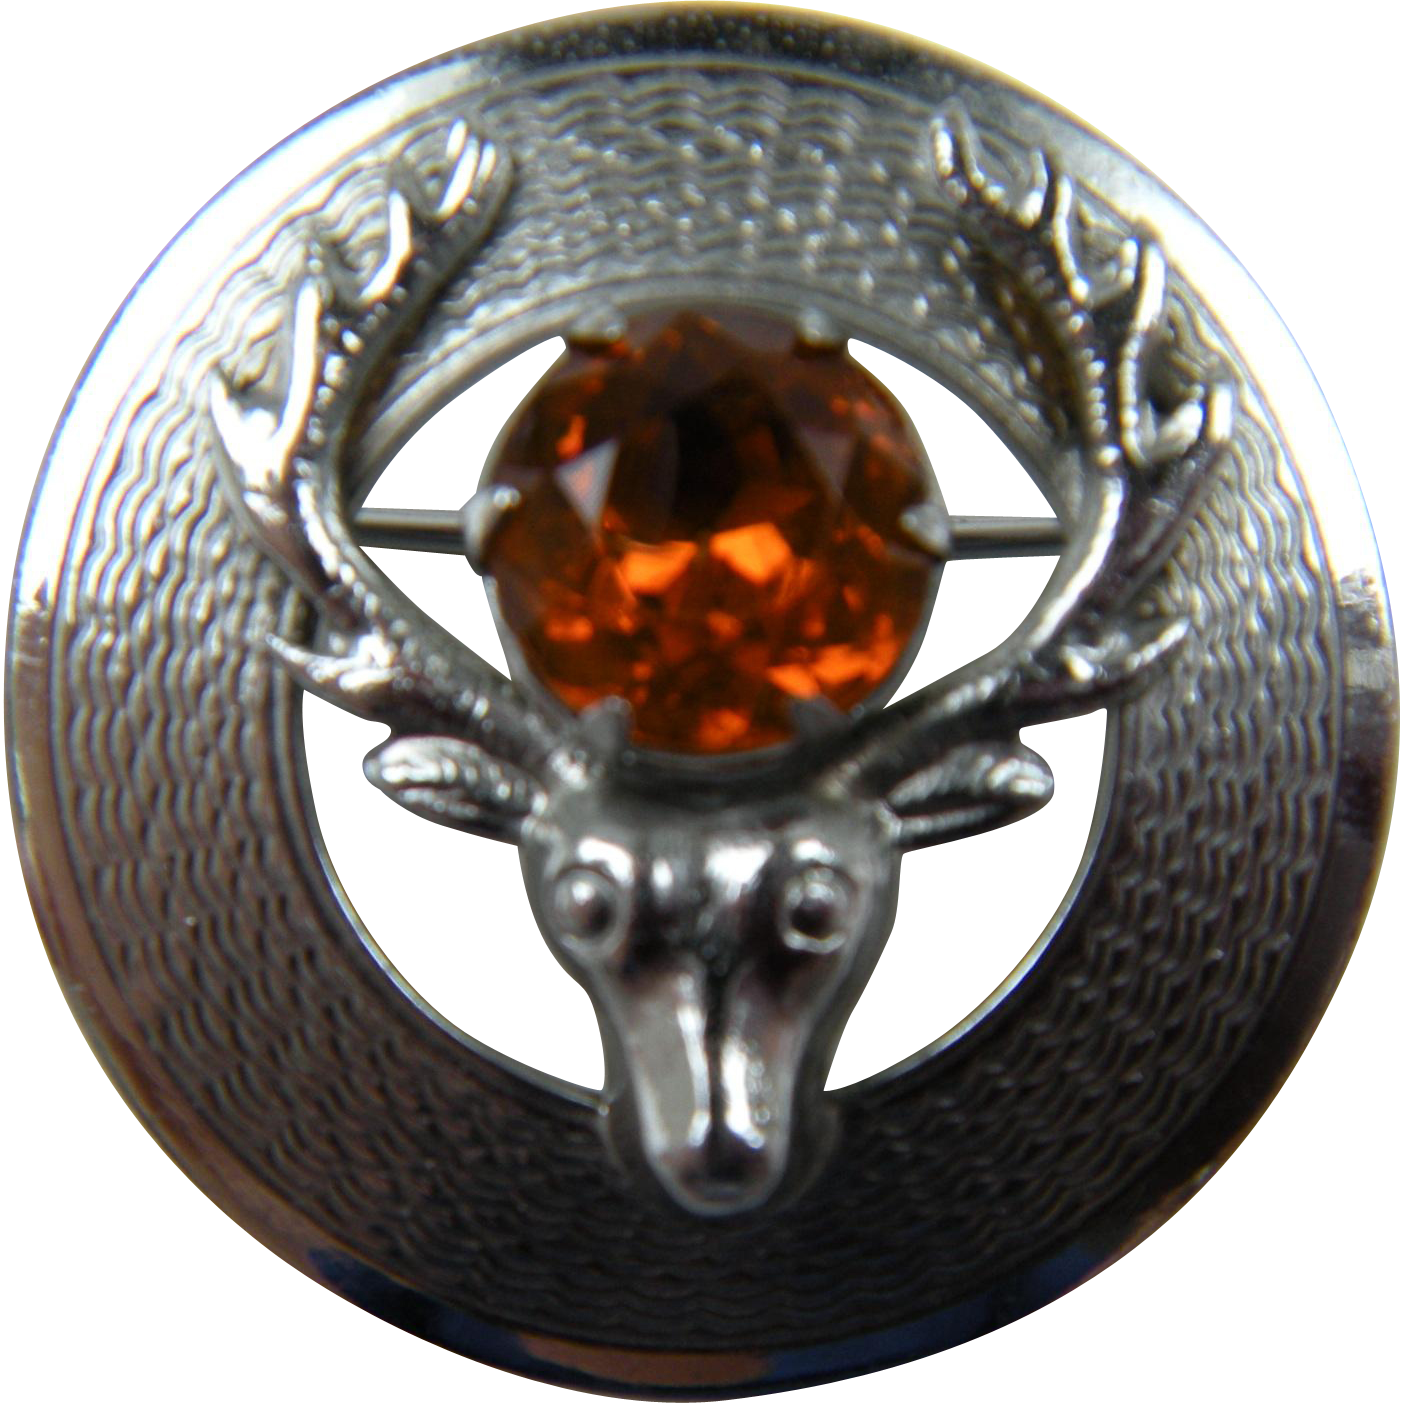 Signed MIZPAH Deer Brooch with Imitation Golden Topaz